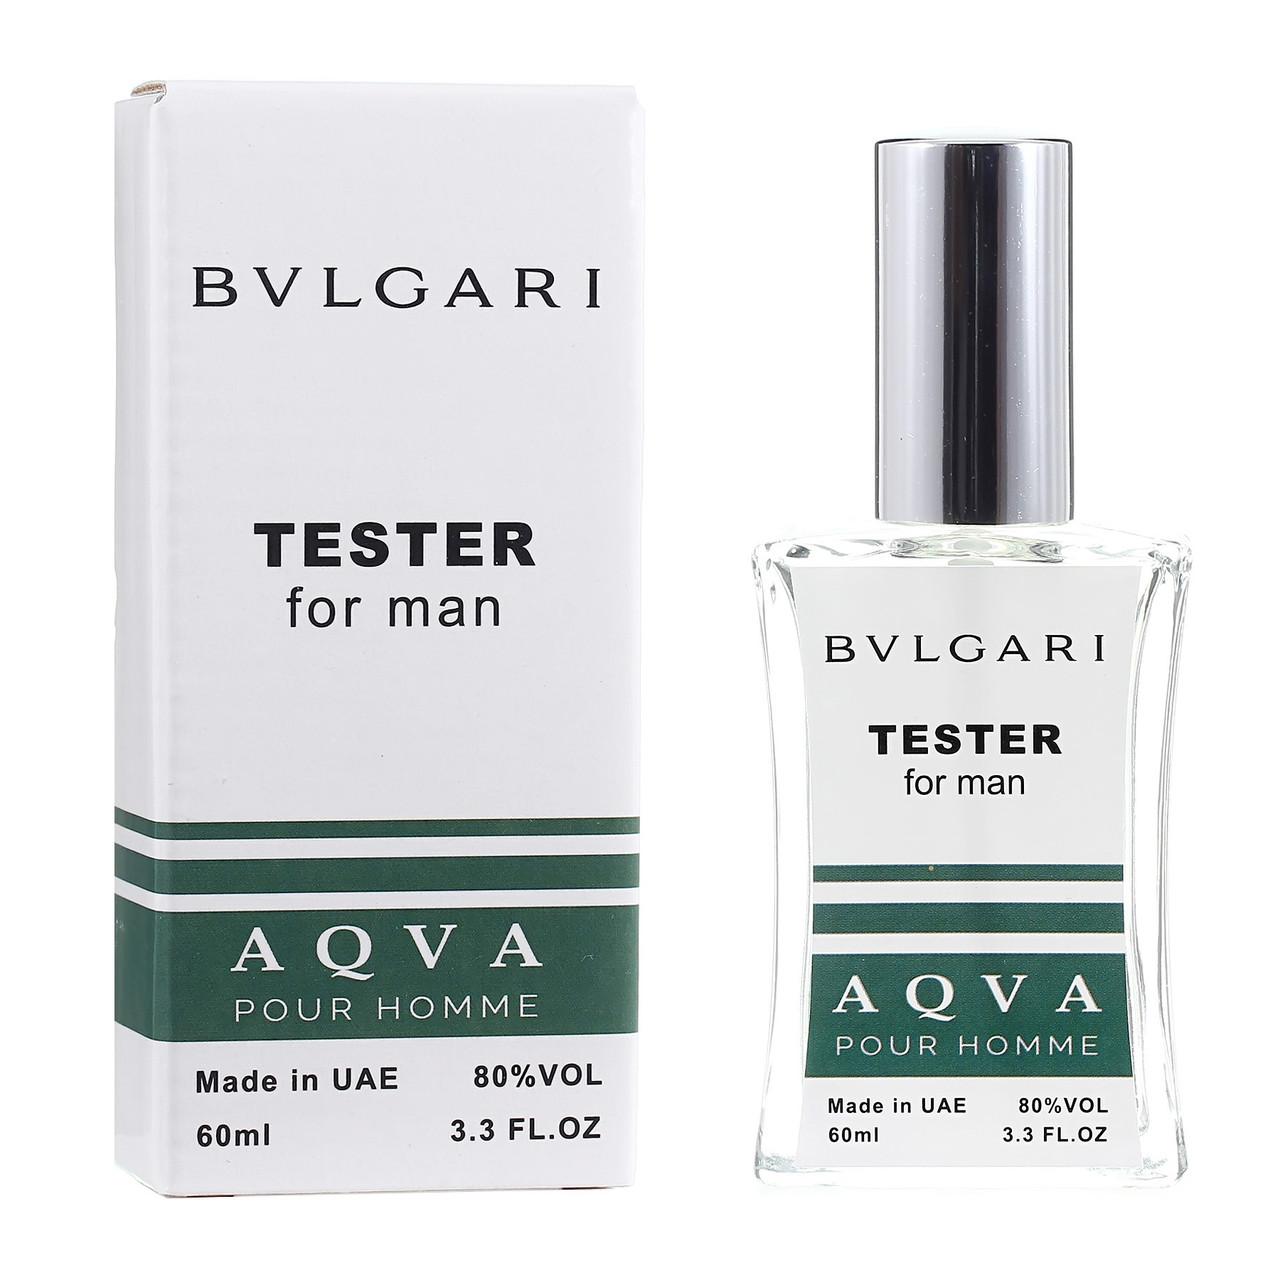 Тестер Bvlgari Aqva Pour Homme мужской, 60 мл